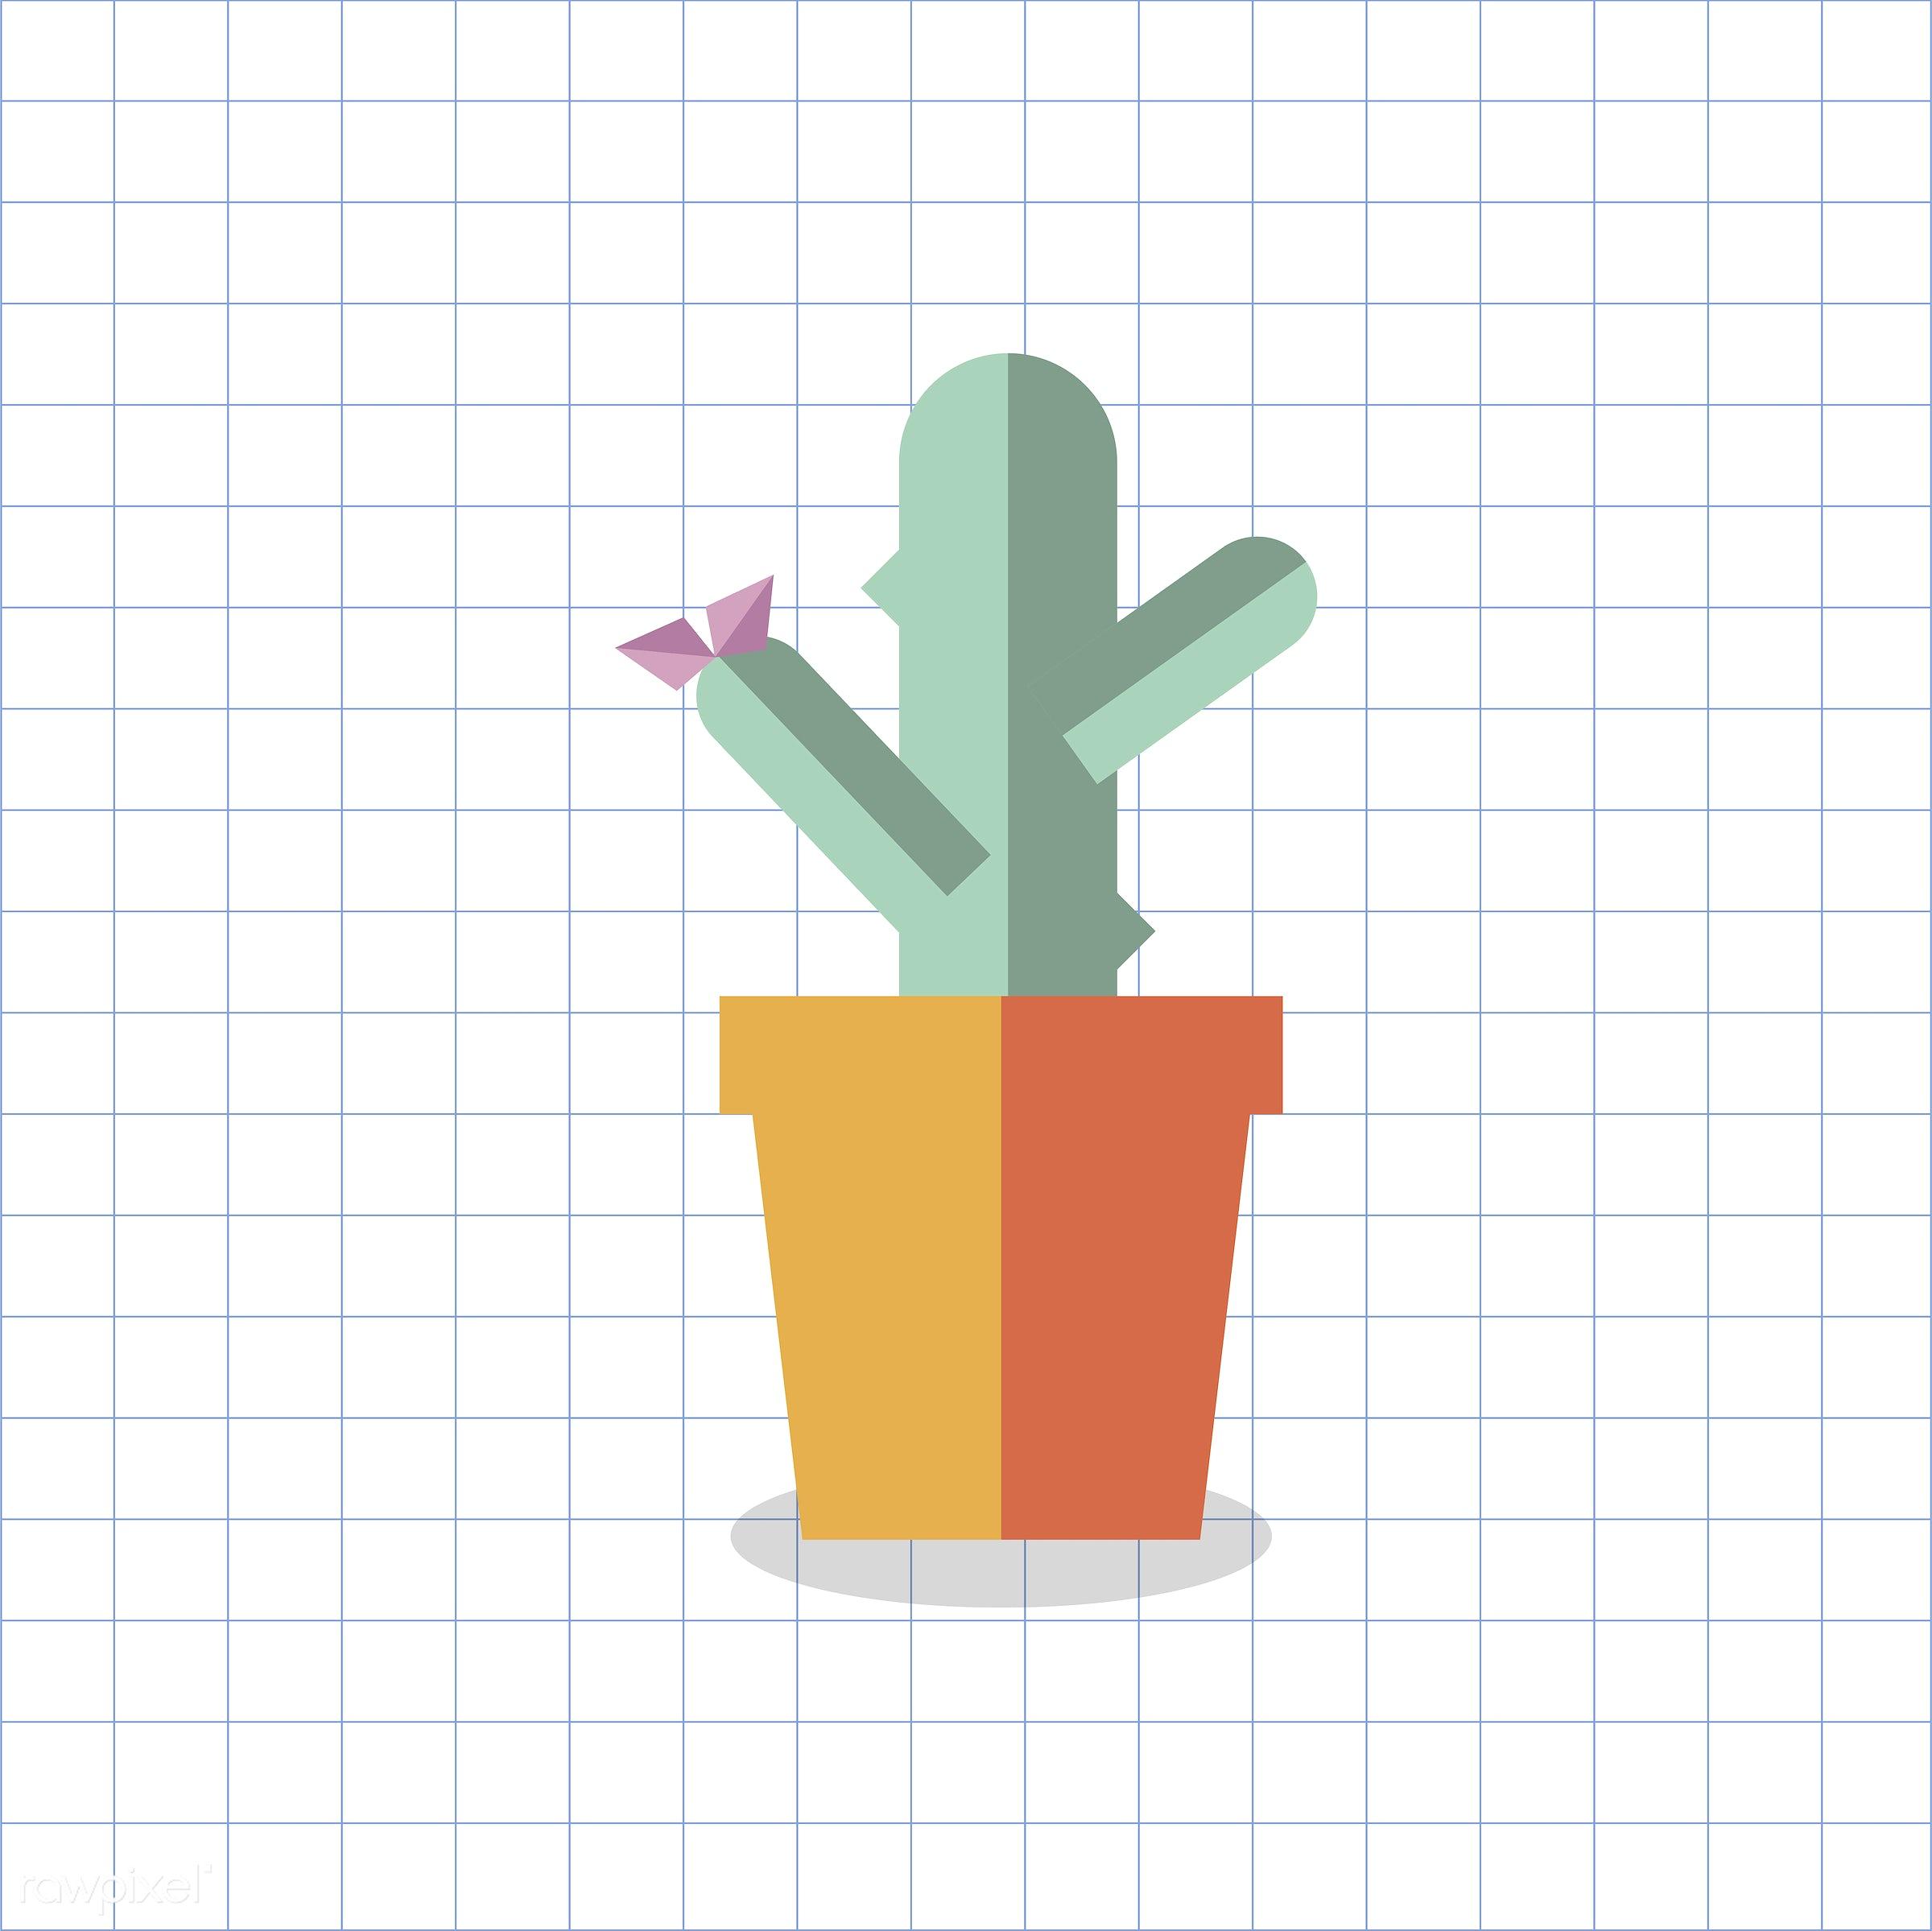 vector, graphic, illustration, icon, symbol, colorful, cute, plant, tree, nature, cactus, cacti, planted, pot, orange